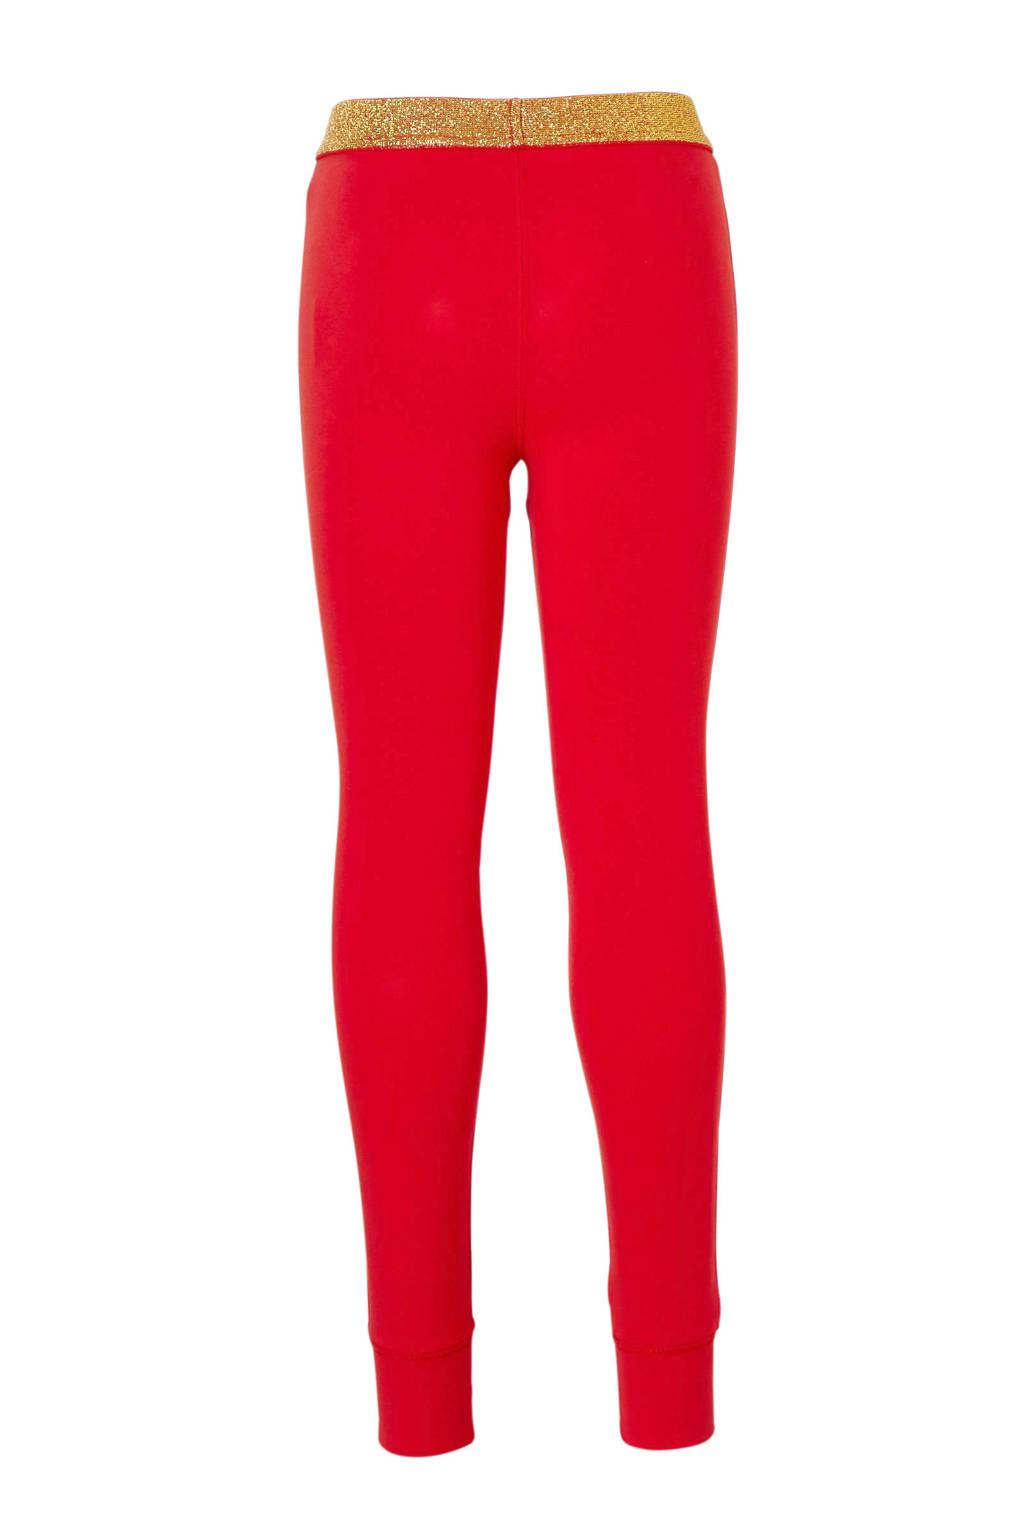 Z8 legging Britney rood, Rood